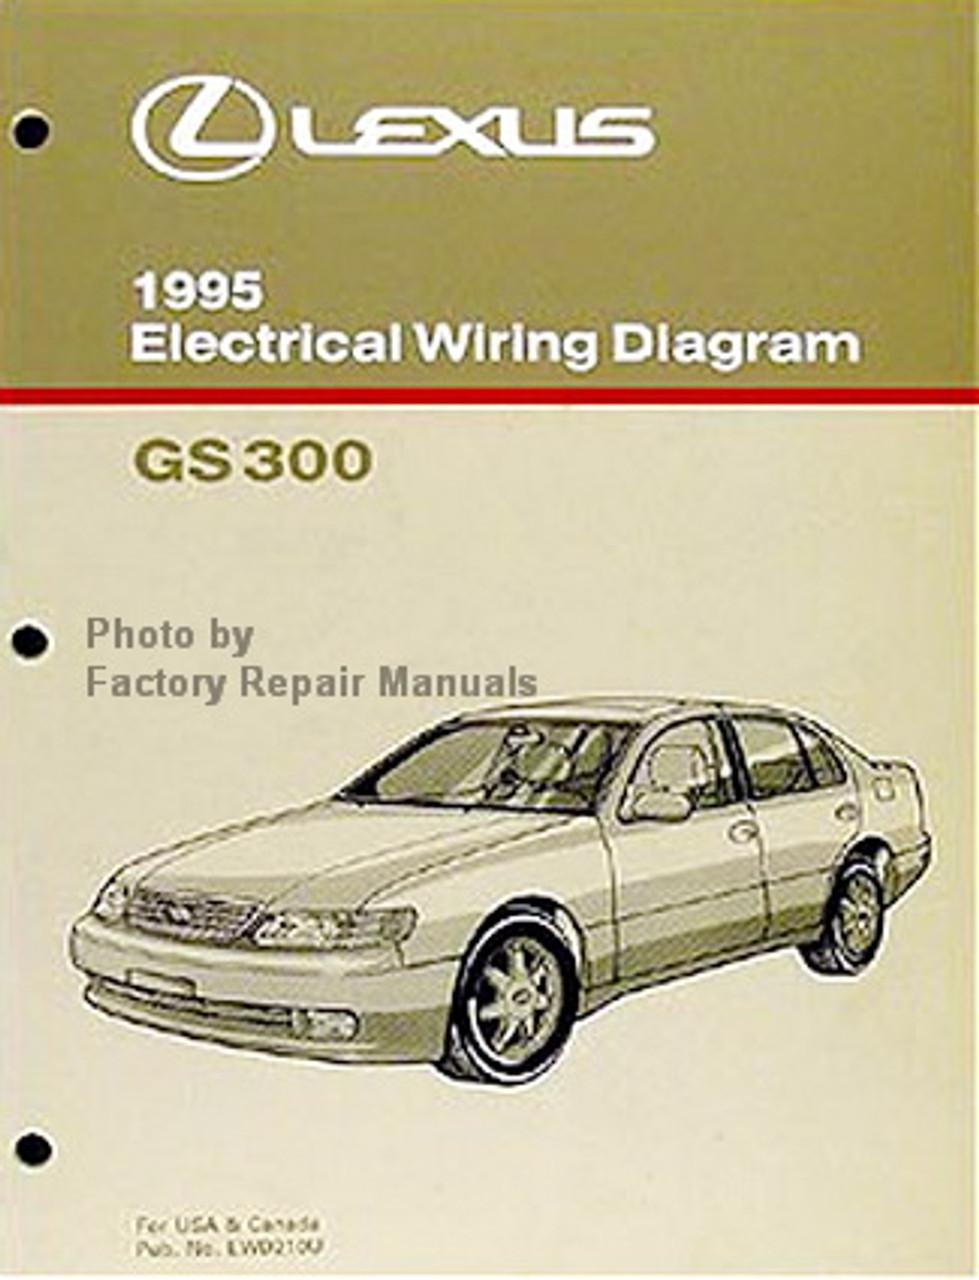 95 lexus engine diagram 1995 lexus gs300 electrical wiring diagrams gs 300 original manual  lexus gs300 electrical wiring diagrams